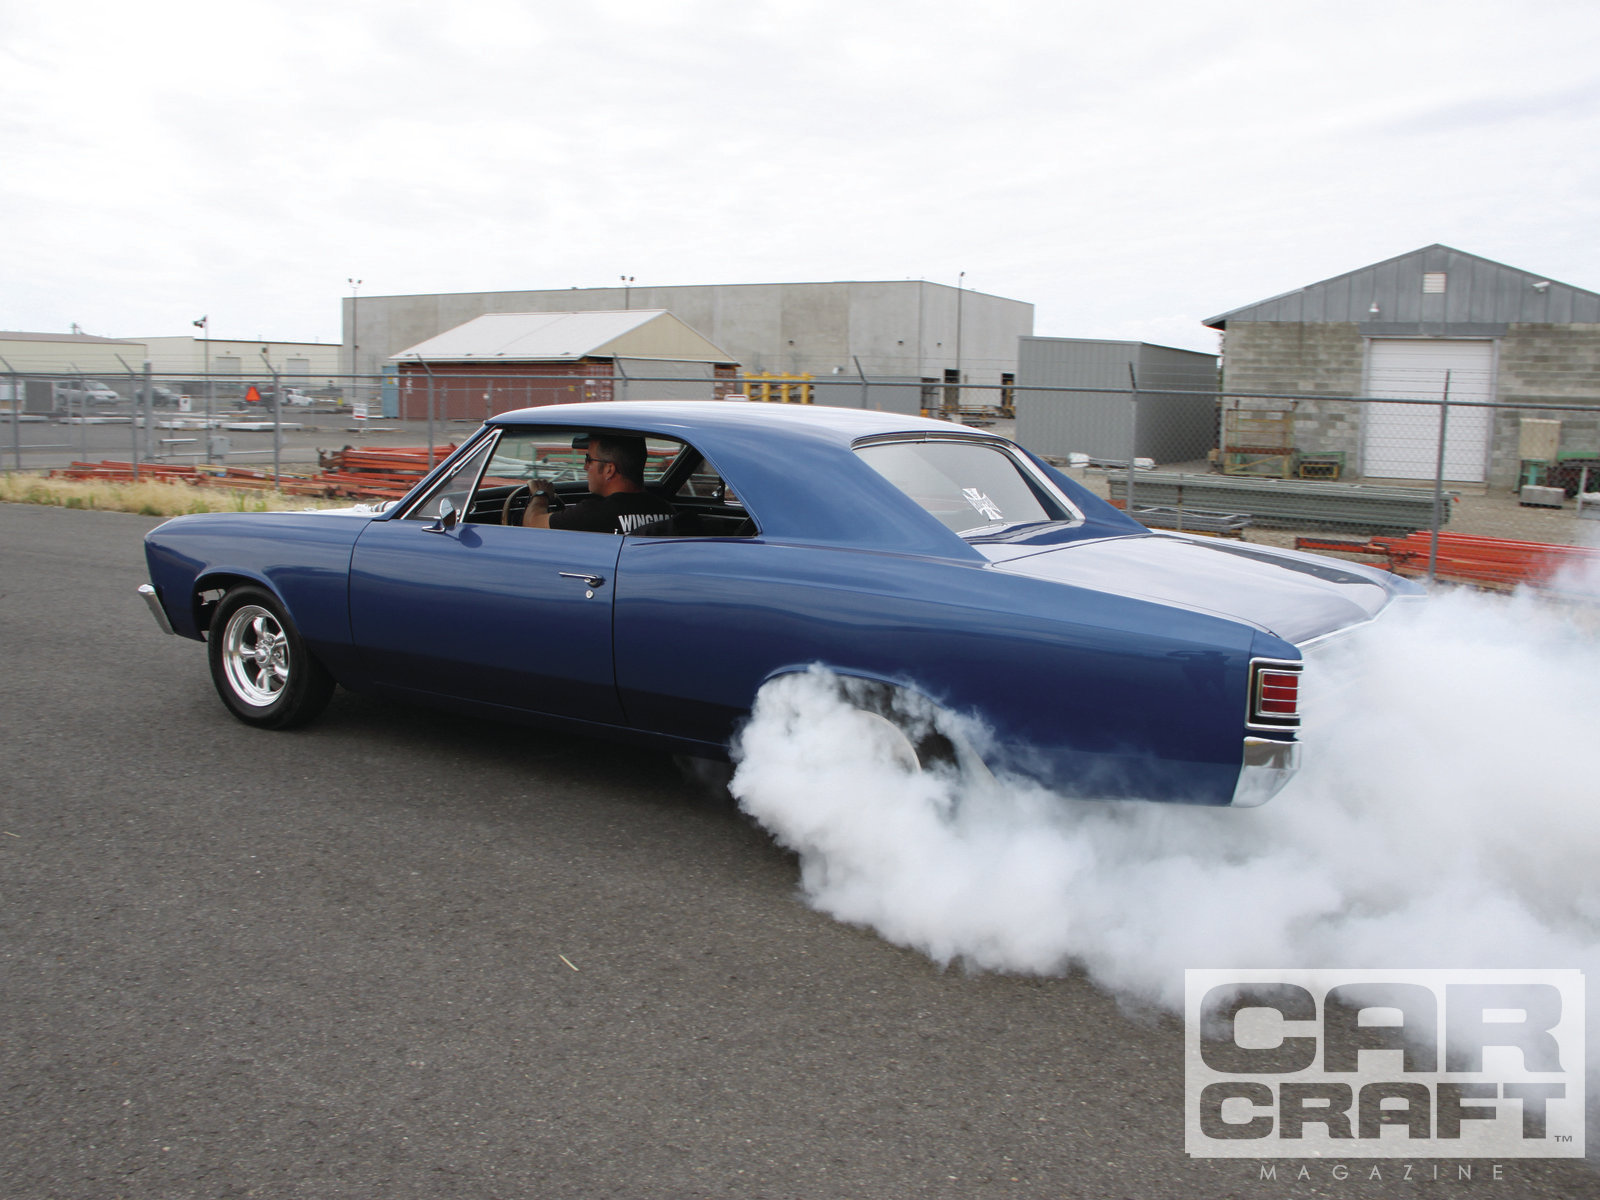 67 chevrolet chevelle wallpaper Car Pictures 1600x1200